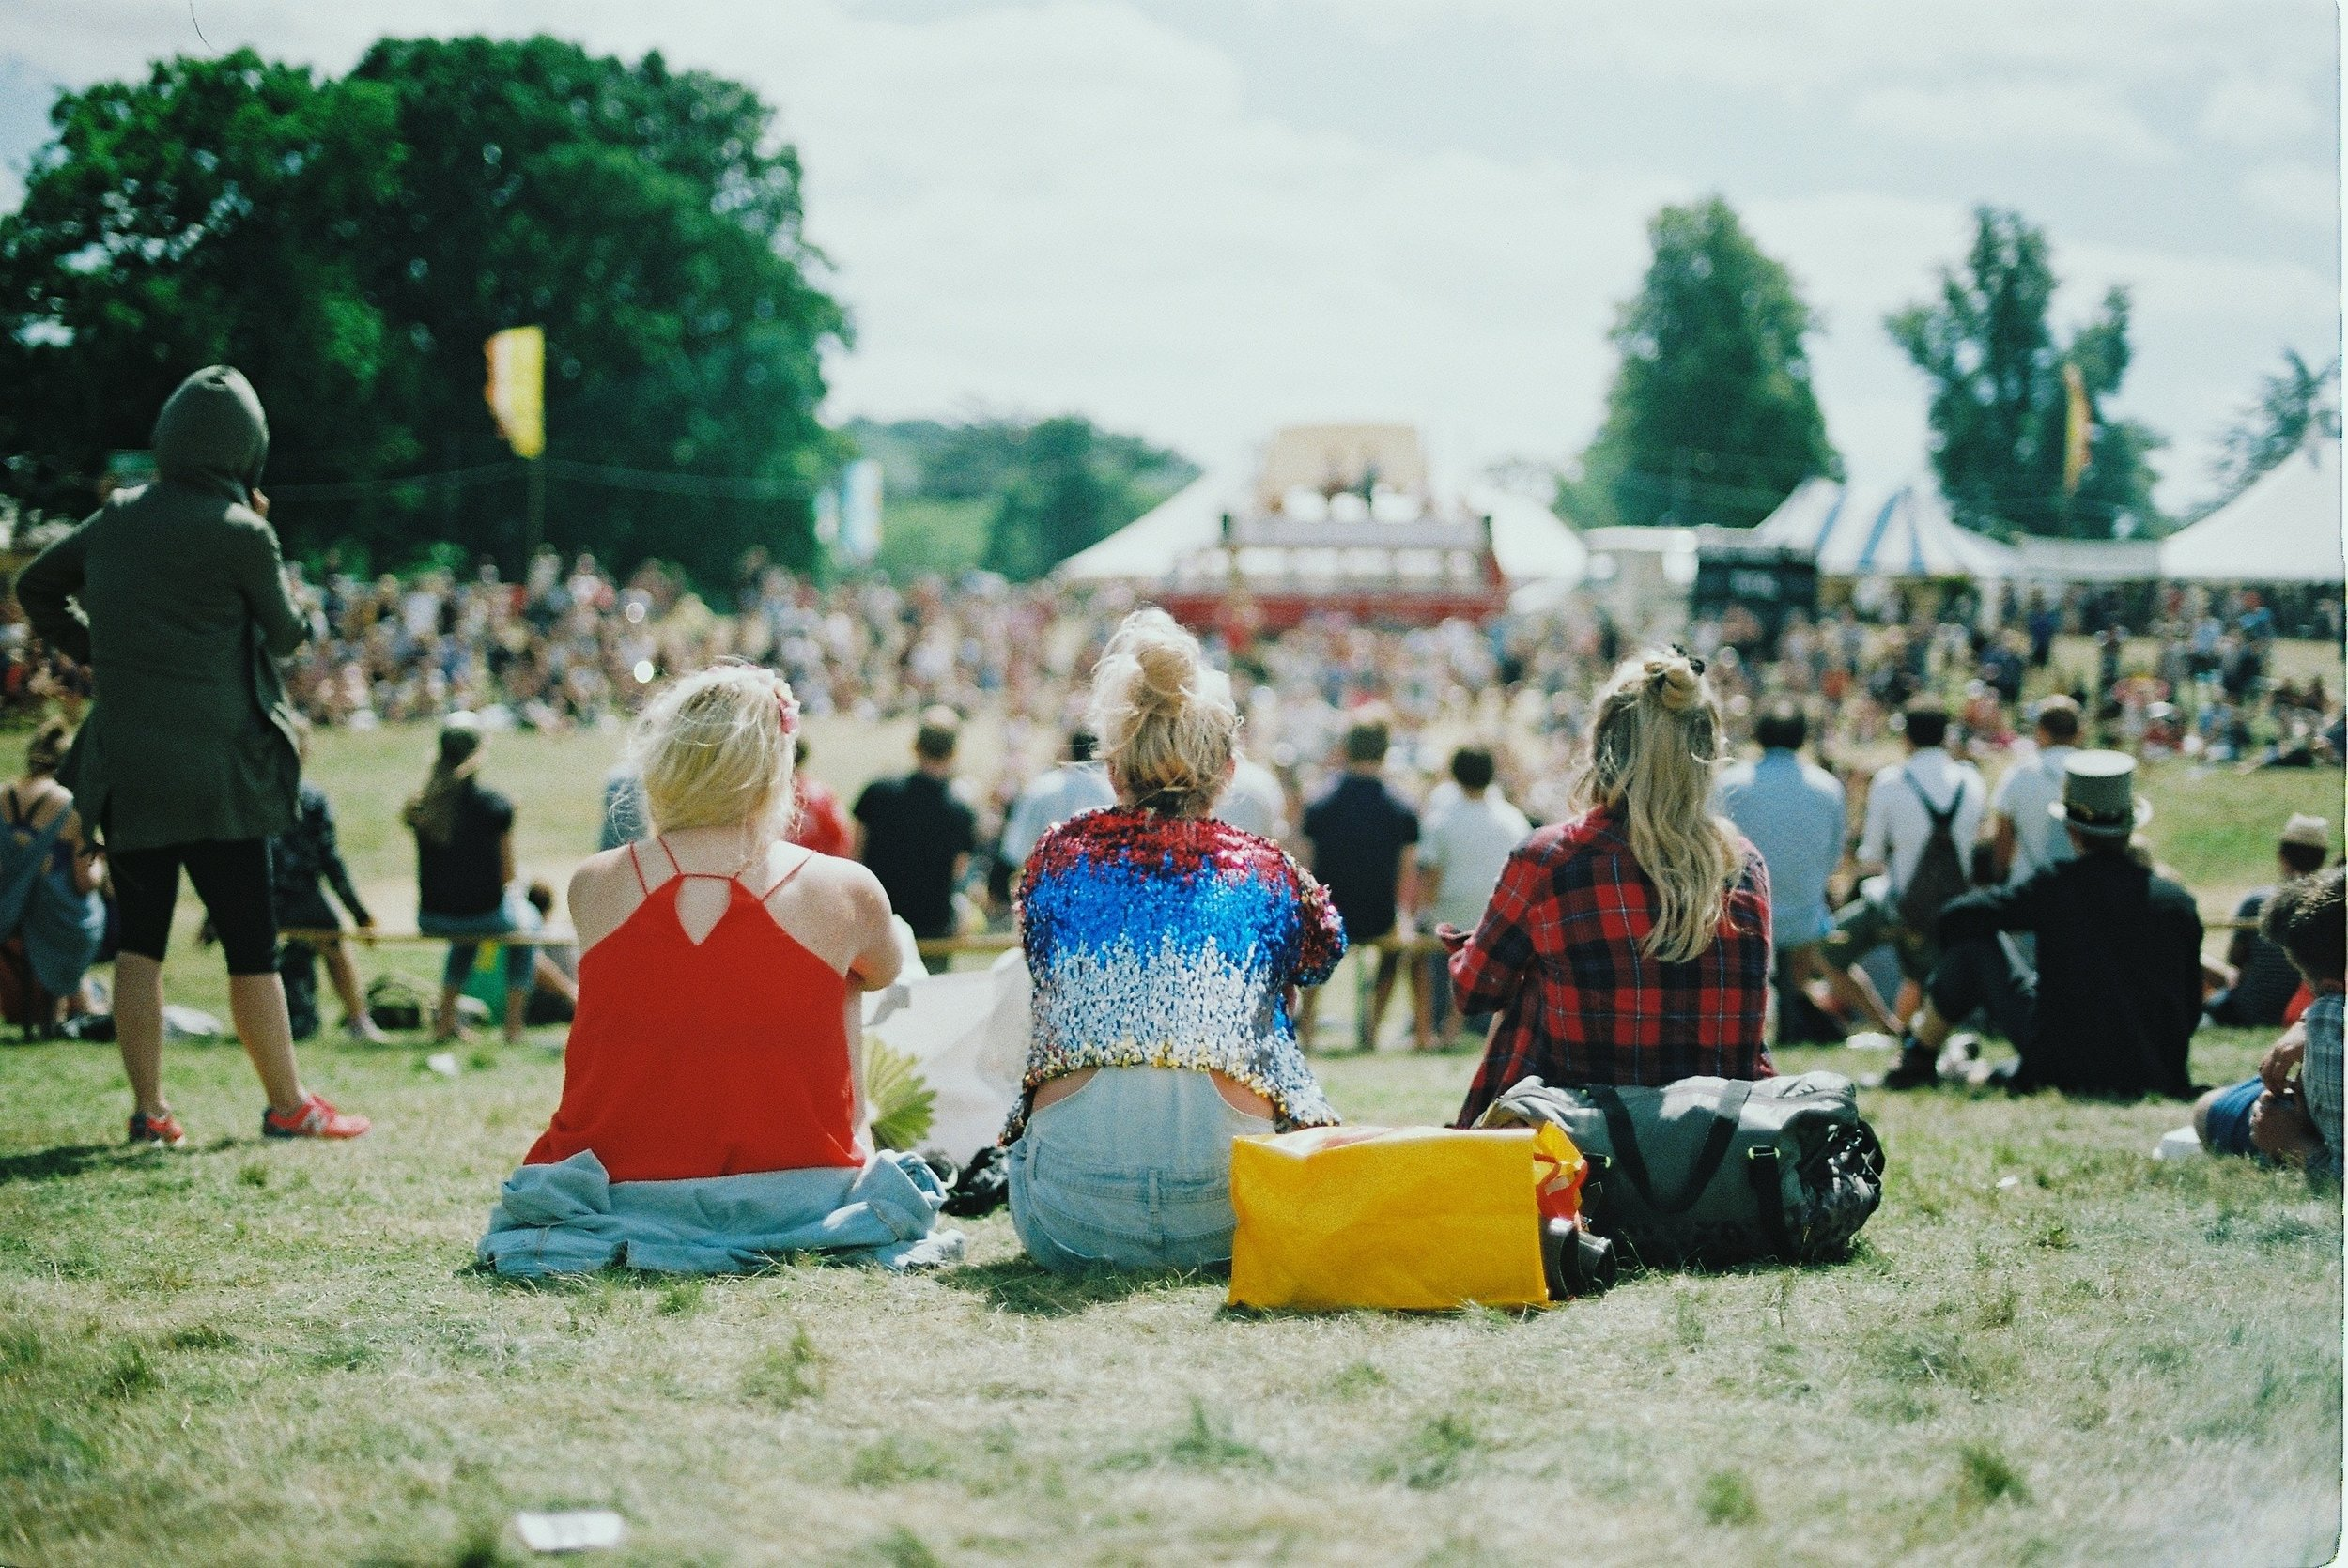 Festival_aranxa-esteve-130752-unsplash.jpg